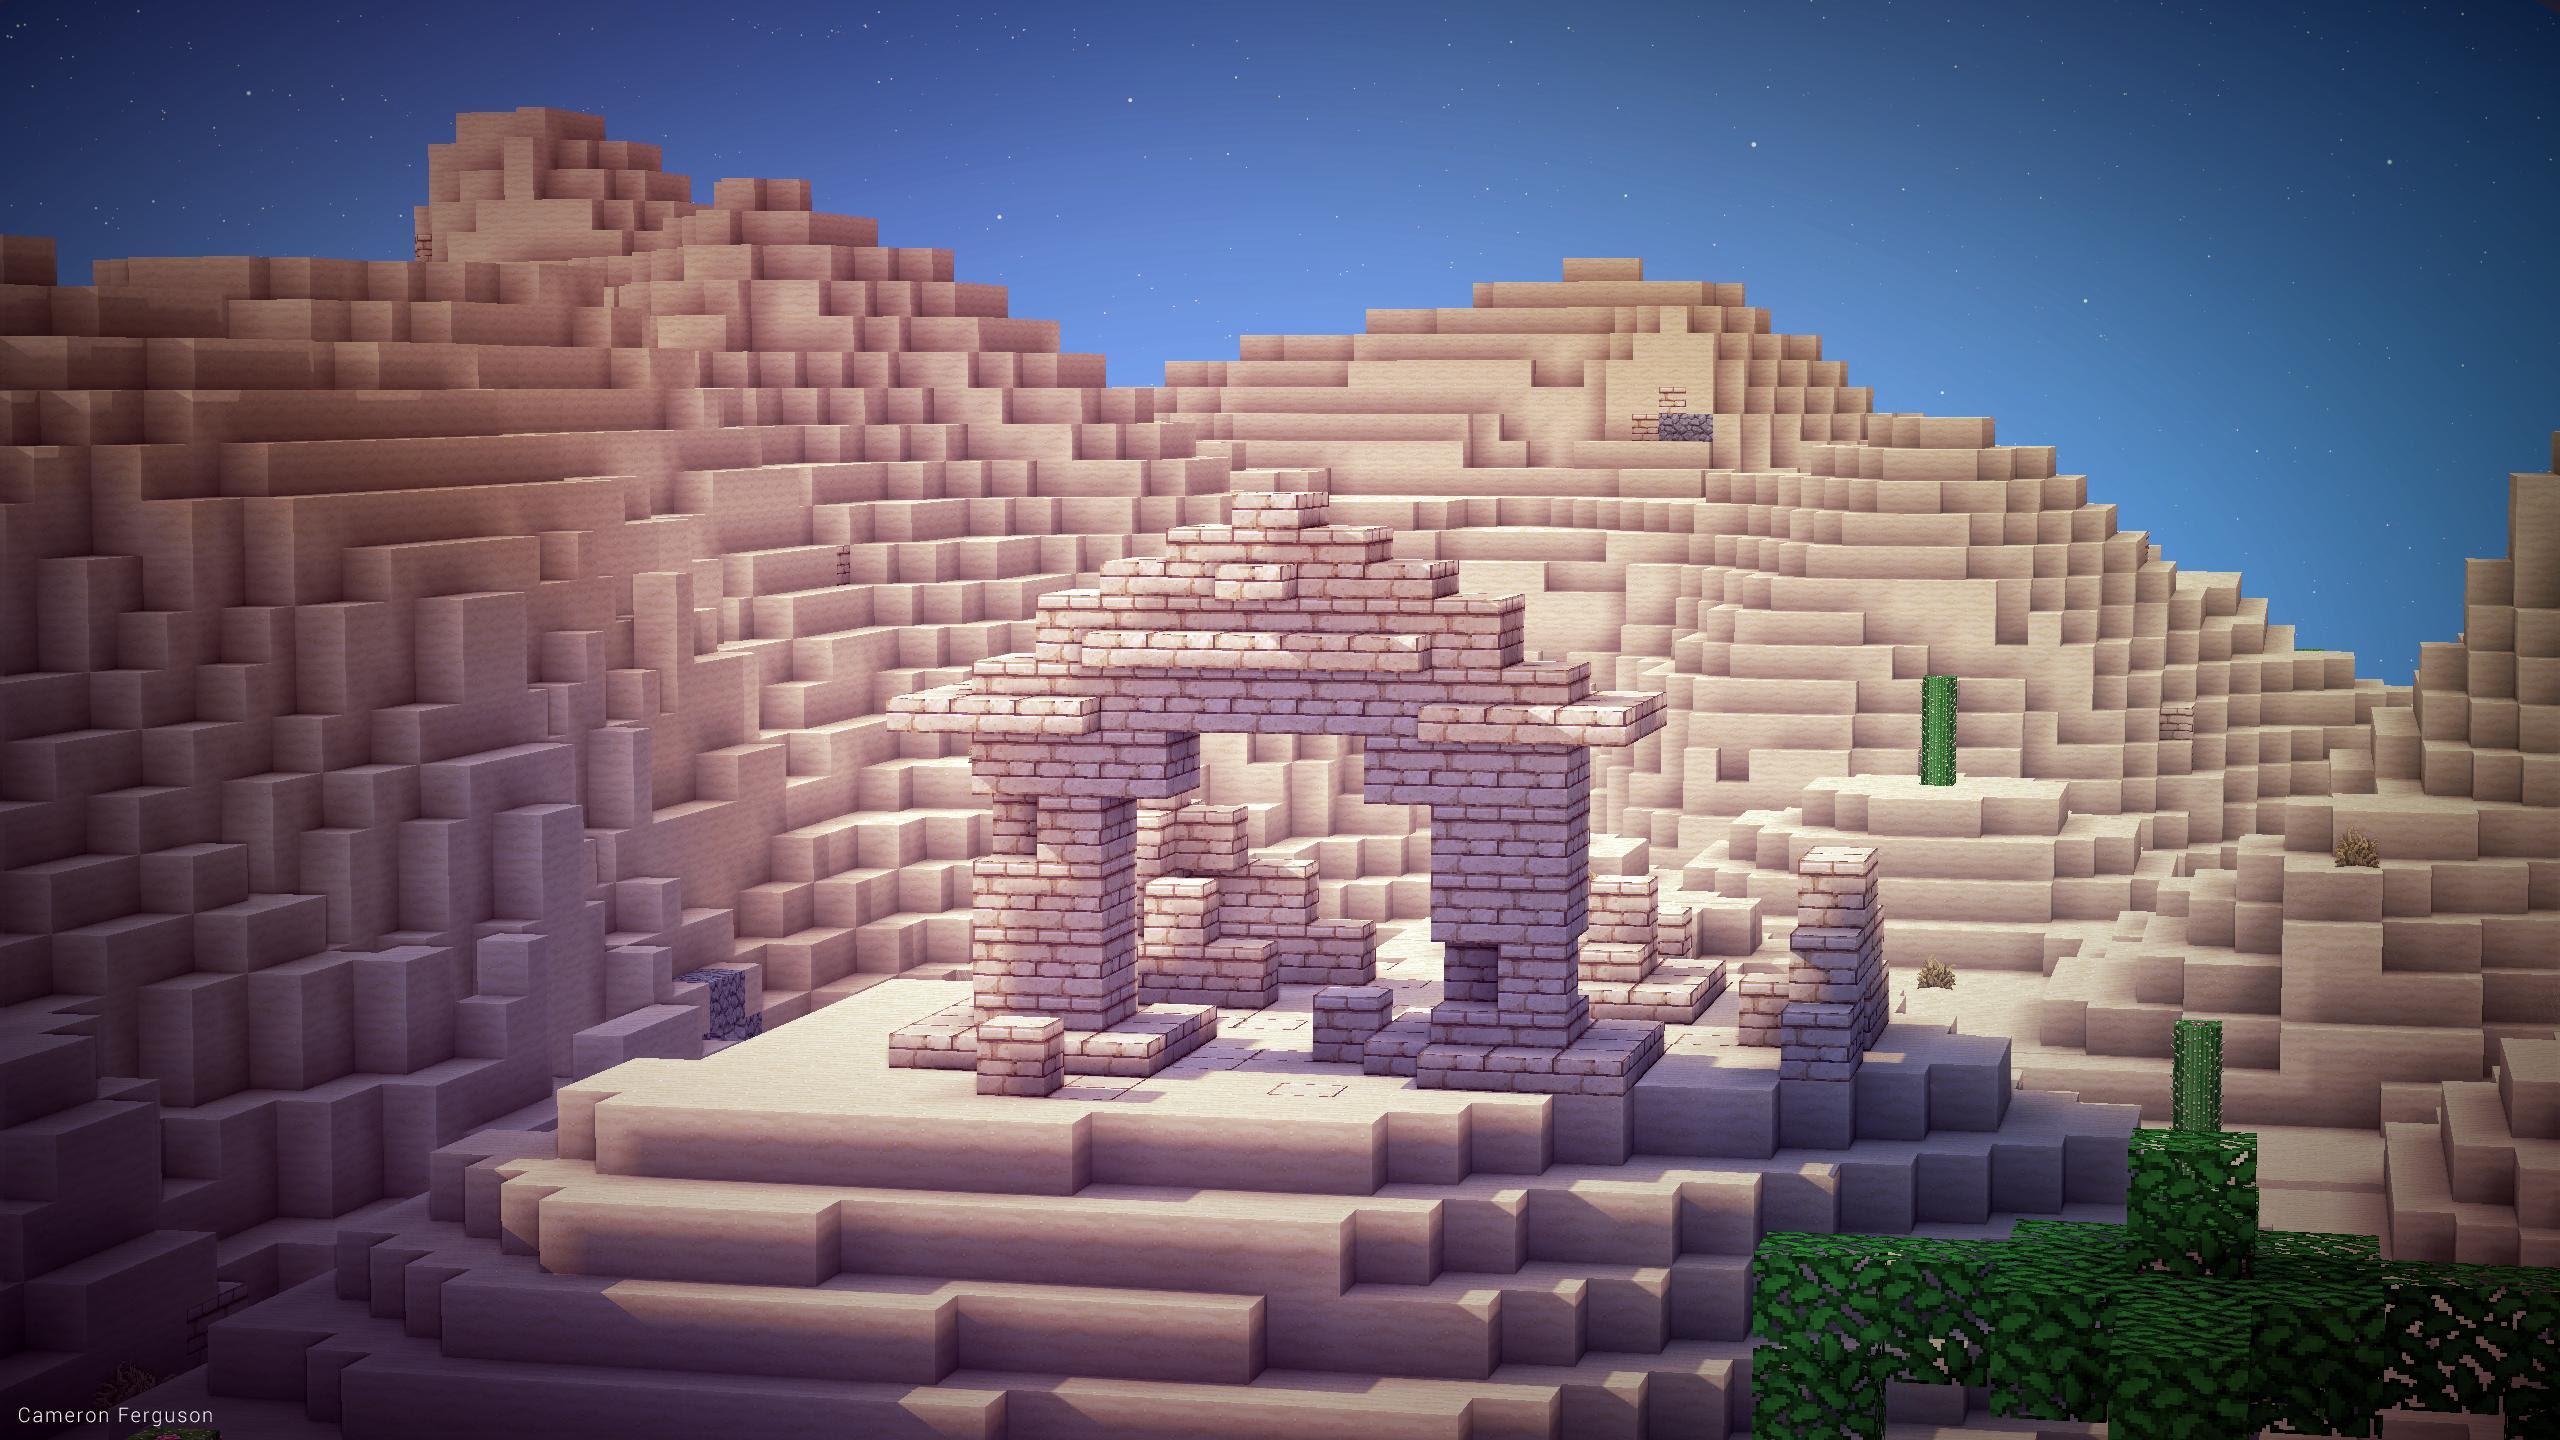 Image Minecraft 2560 X 1440 Jpg Harbolnas E